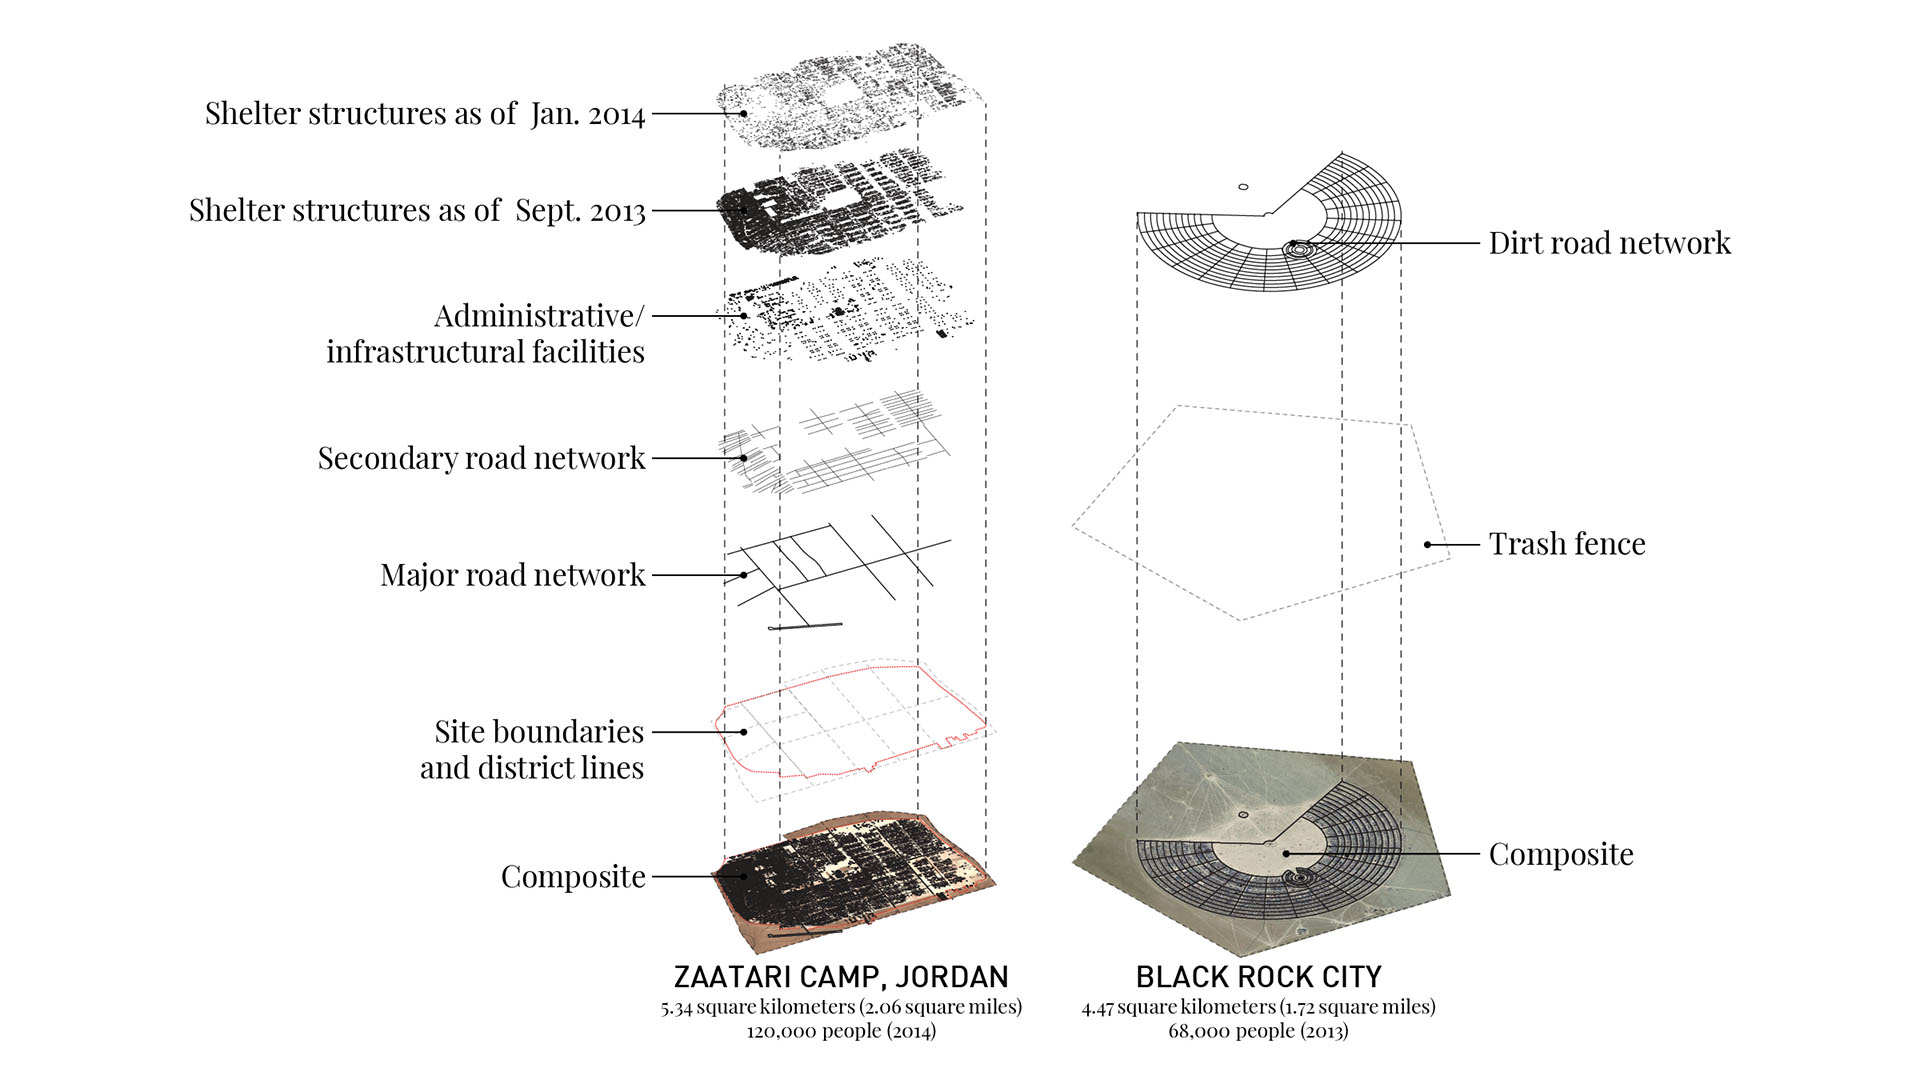 Fig. 8, Black Rock City and Camp Zaatari